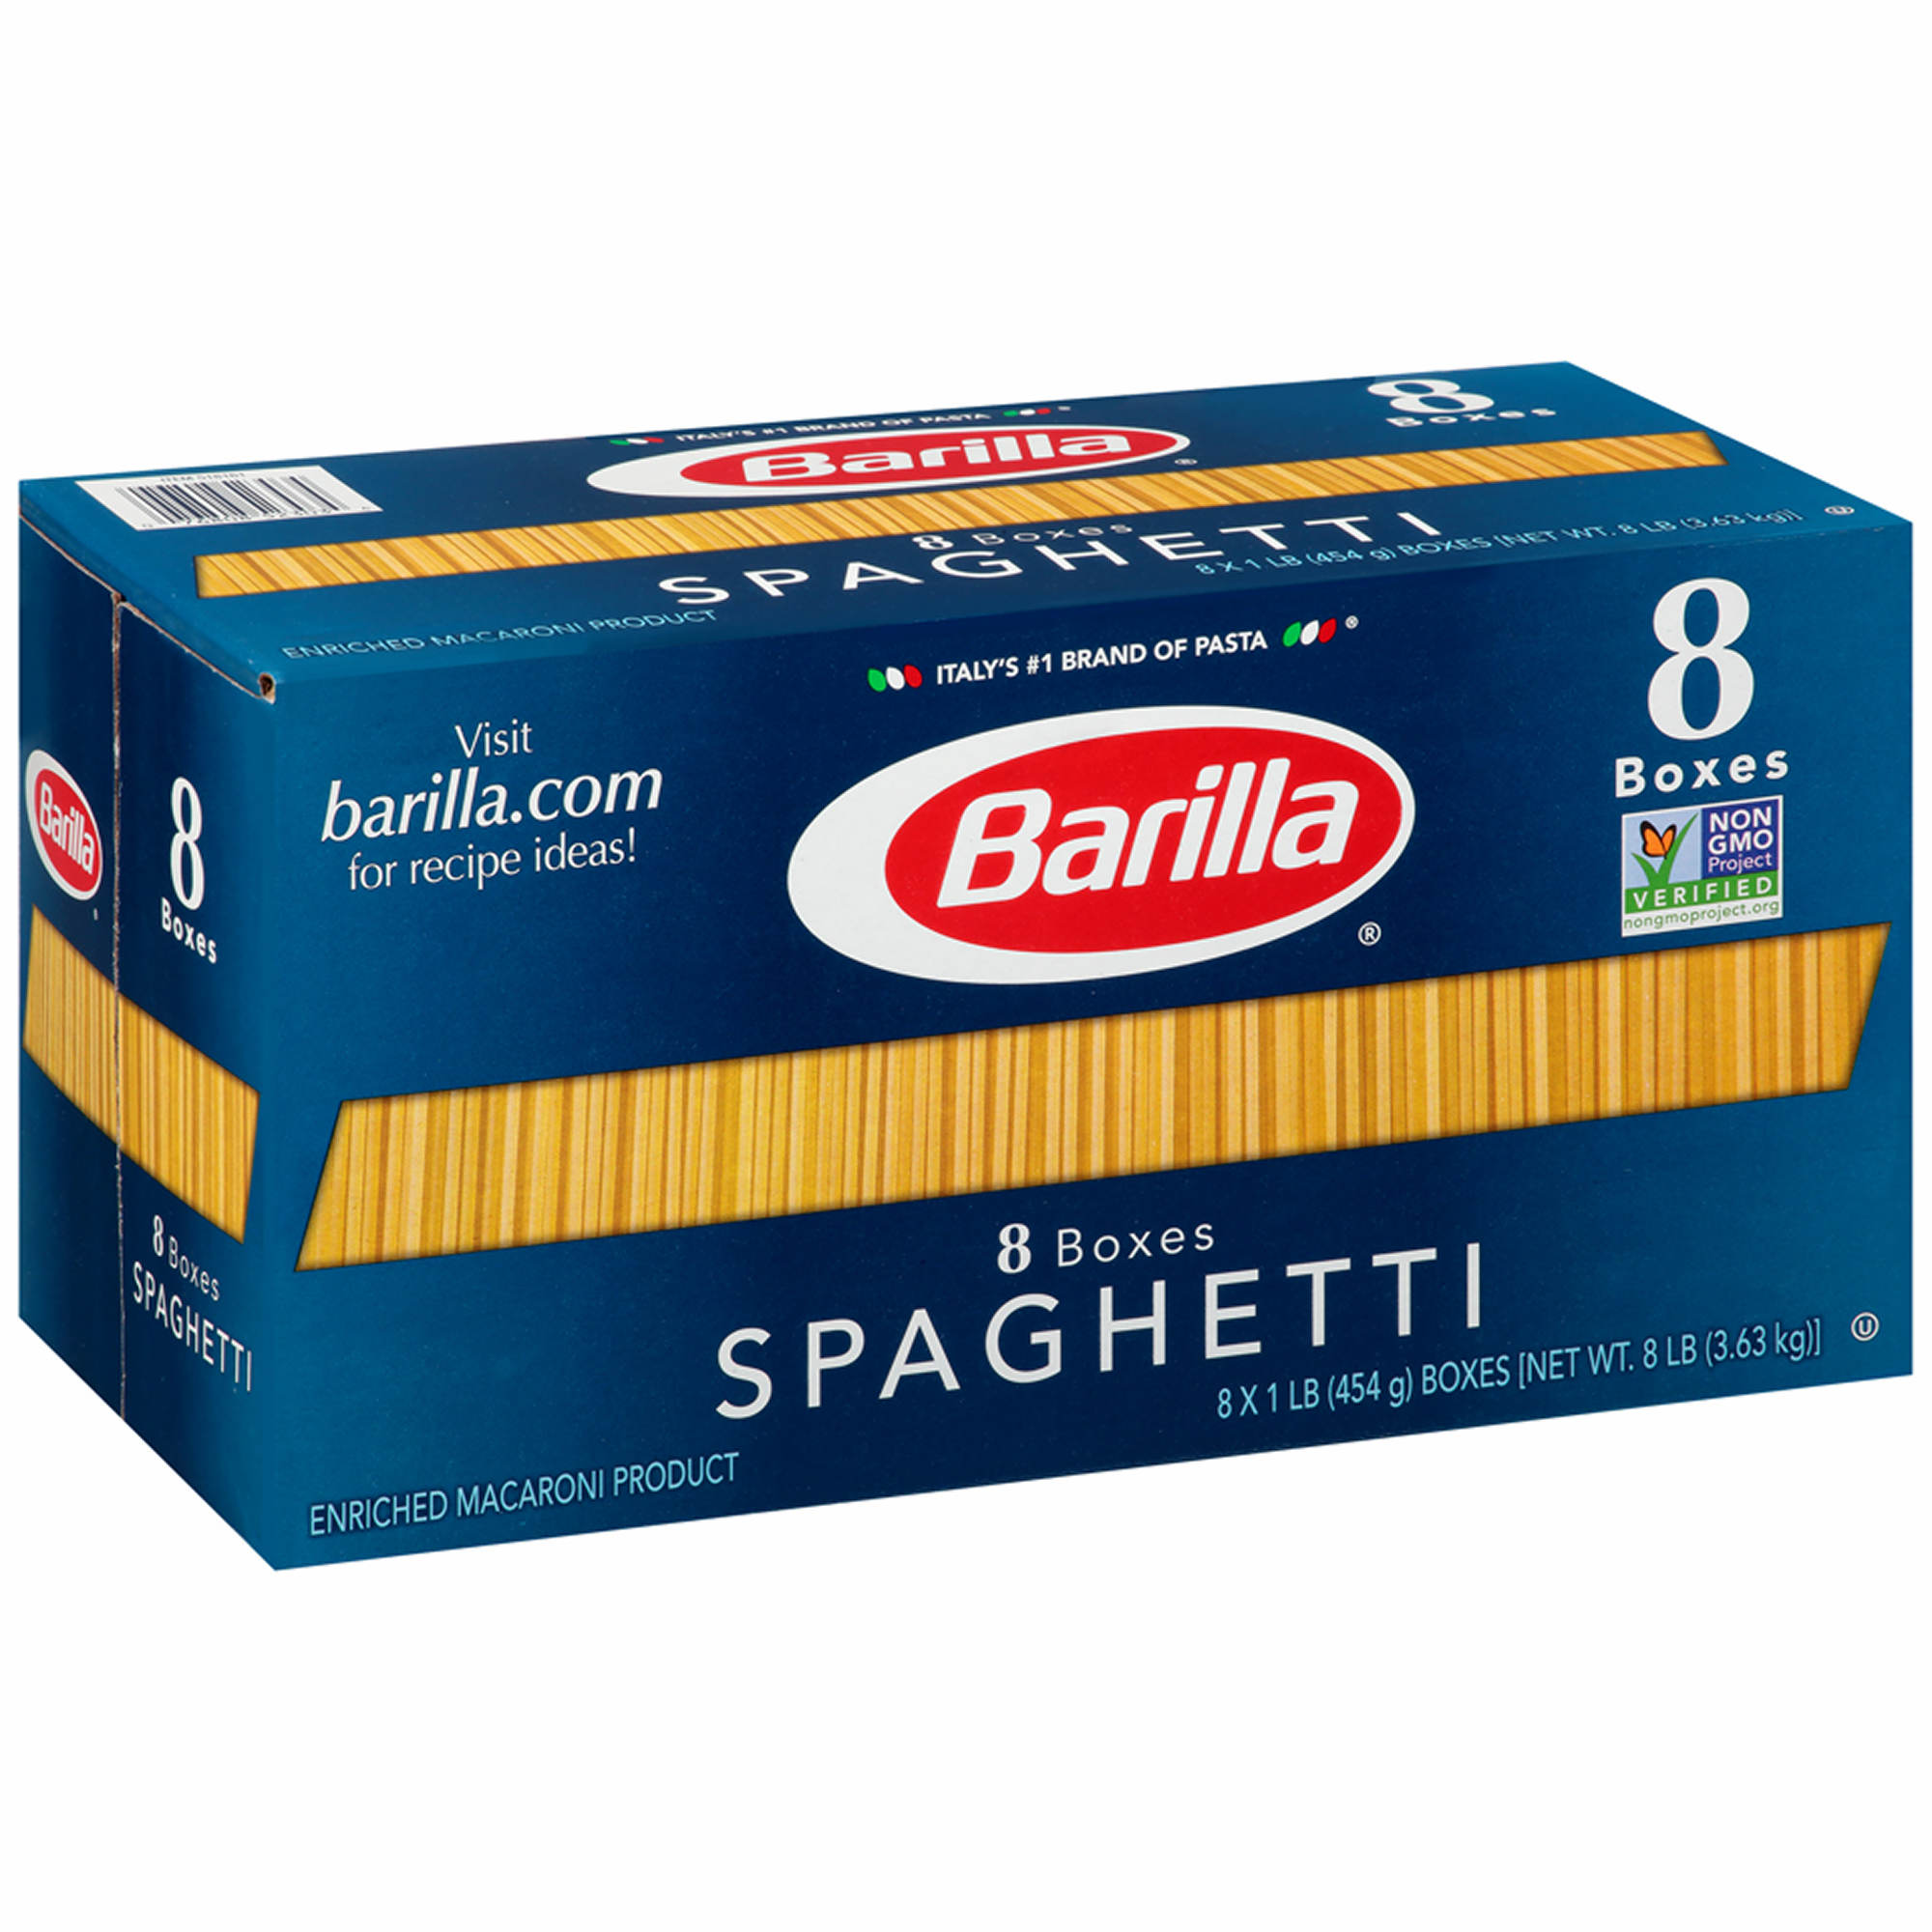 barilla spaghetti pasta 16 oz 8 pk bj s whole club barilla spaghetti pasta 16 oz 8 pk